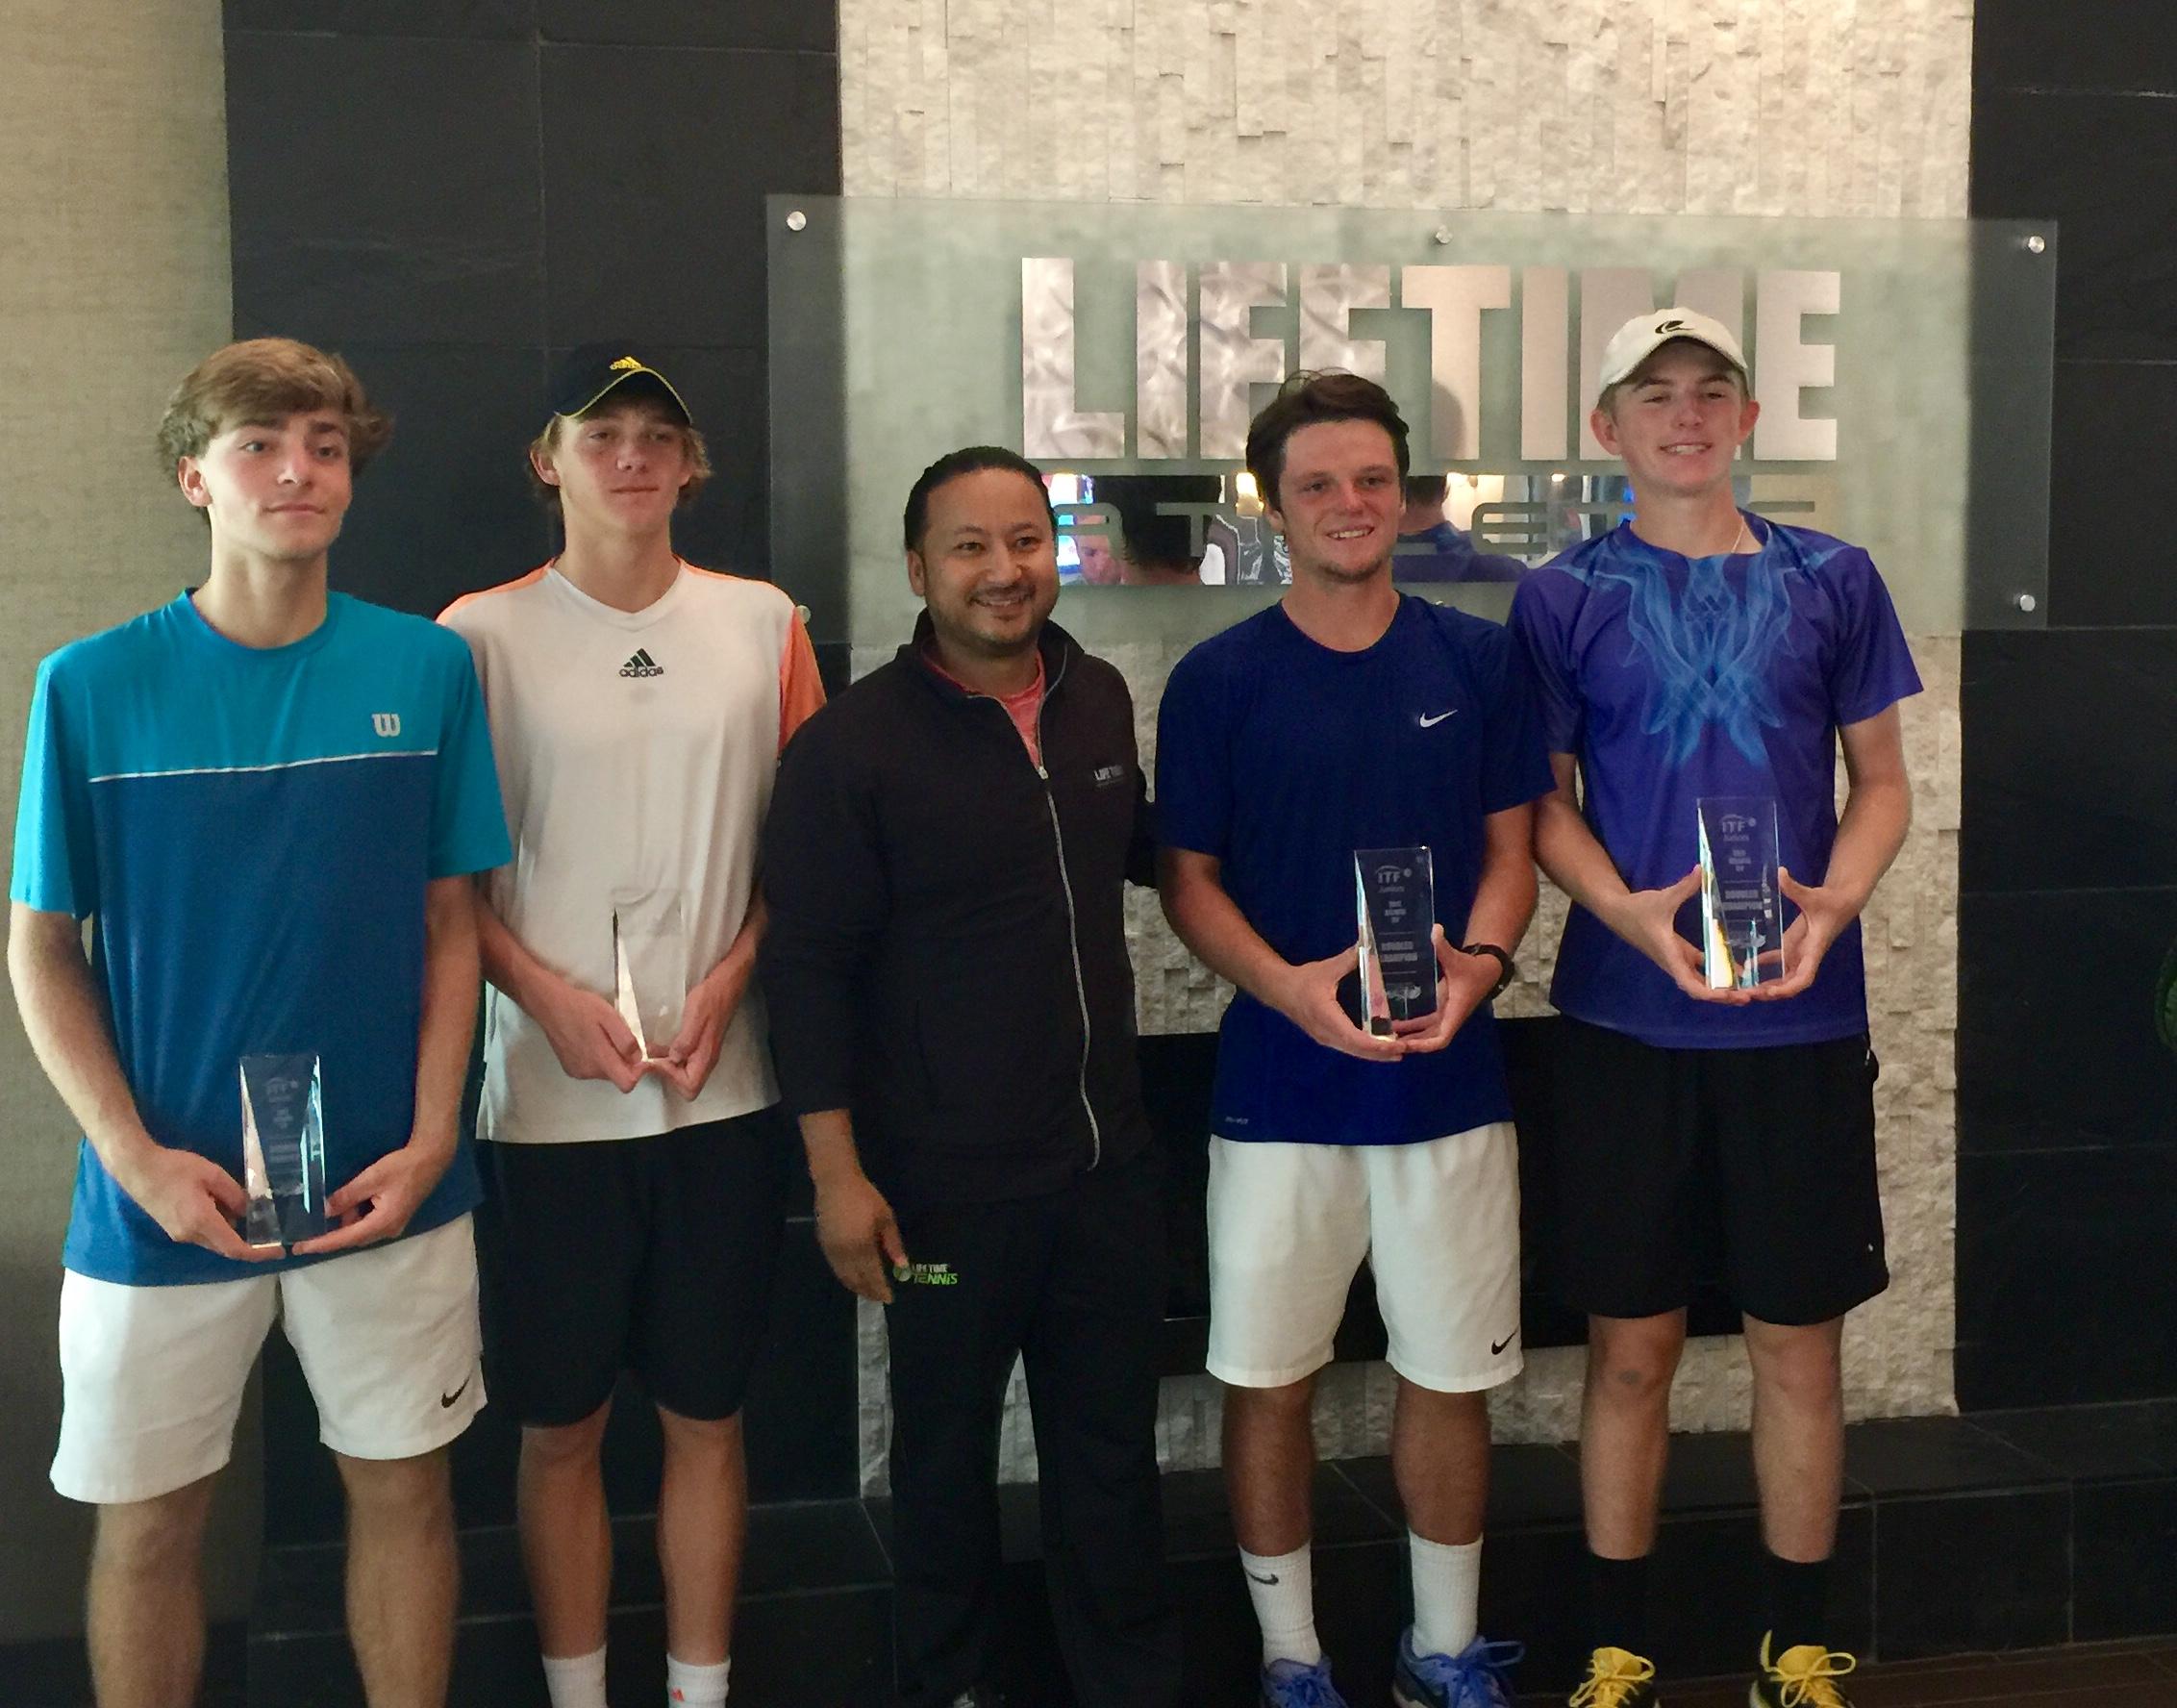 ITF Doubles Champion